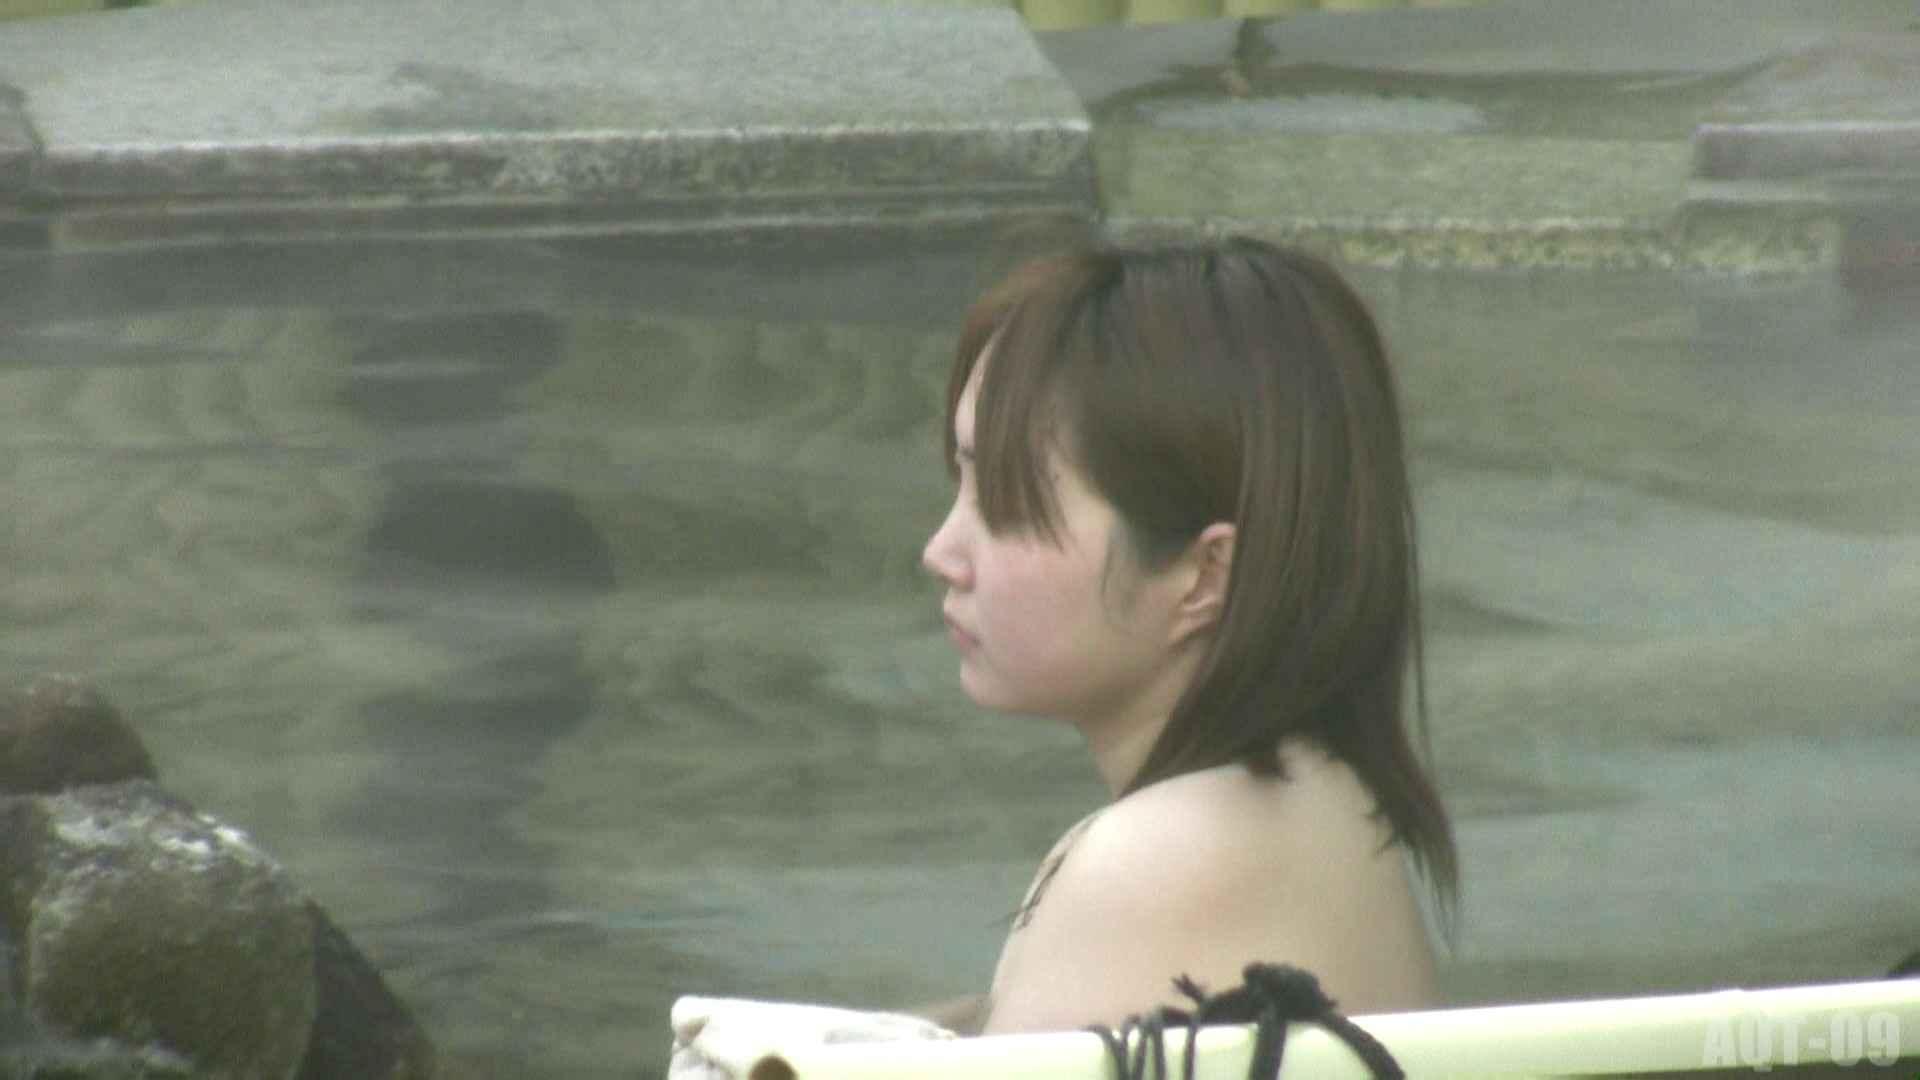 Aquaな露天風呂Vol.781 盗撮 濡れ場動画紹介 93連発 32